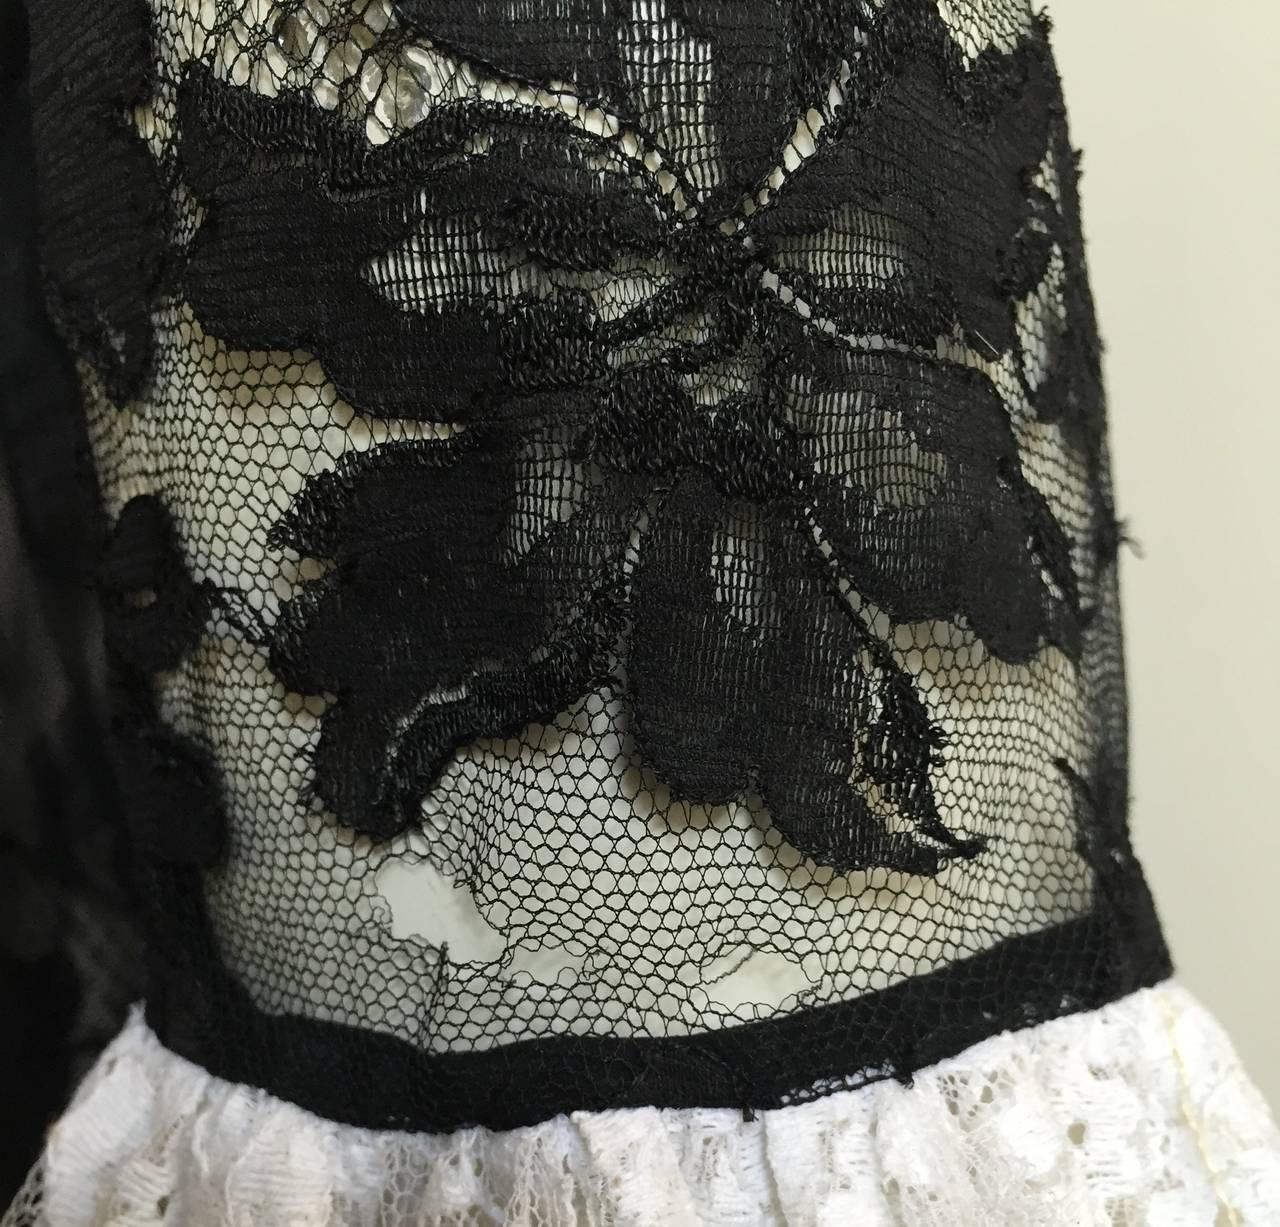 Bill Blass 60s Lace Cocktail Evening Dress Size 6. 7